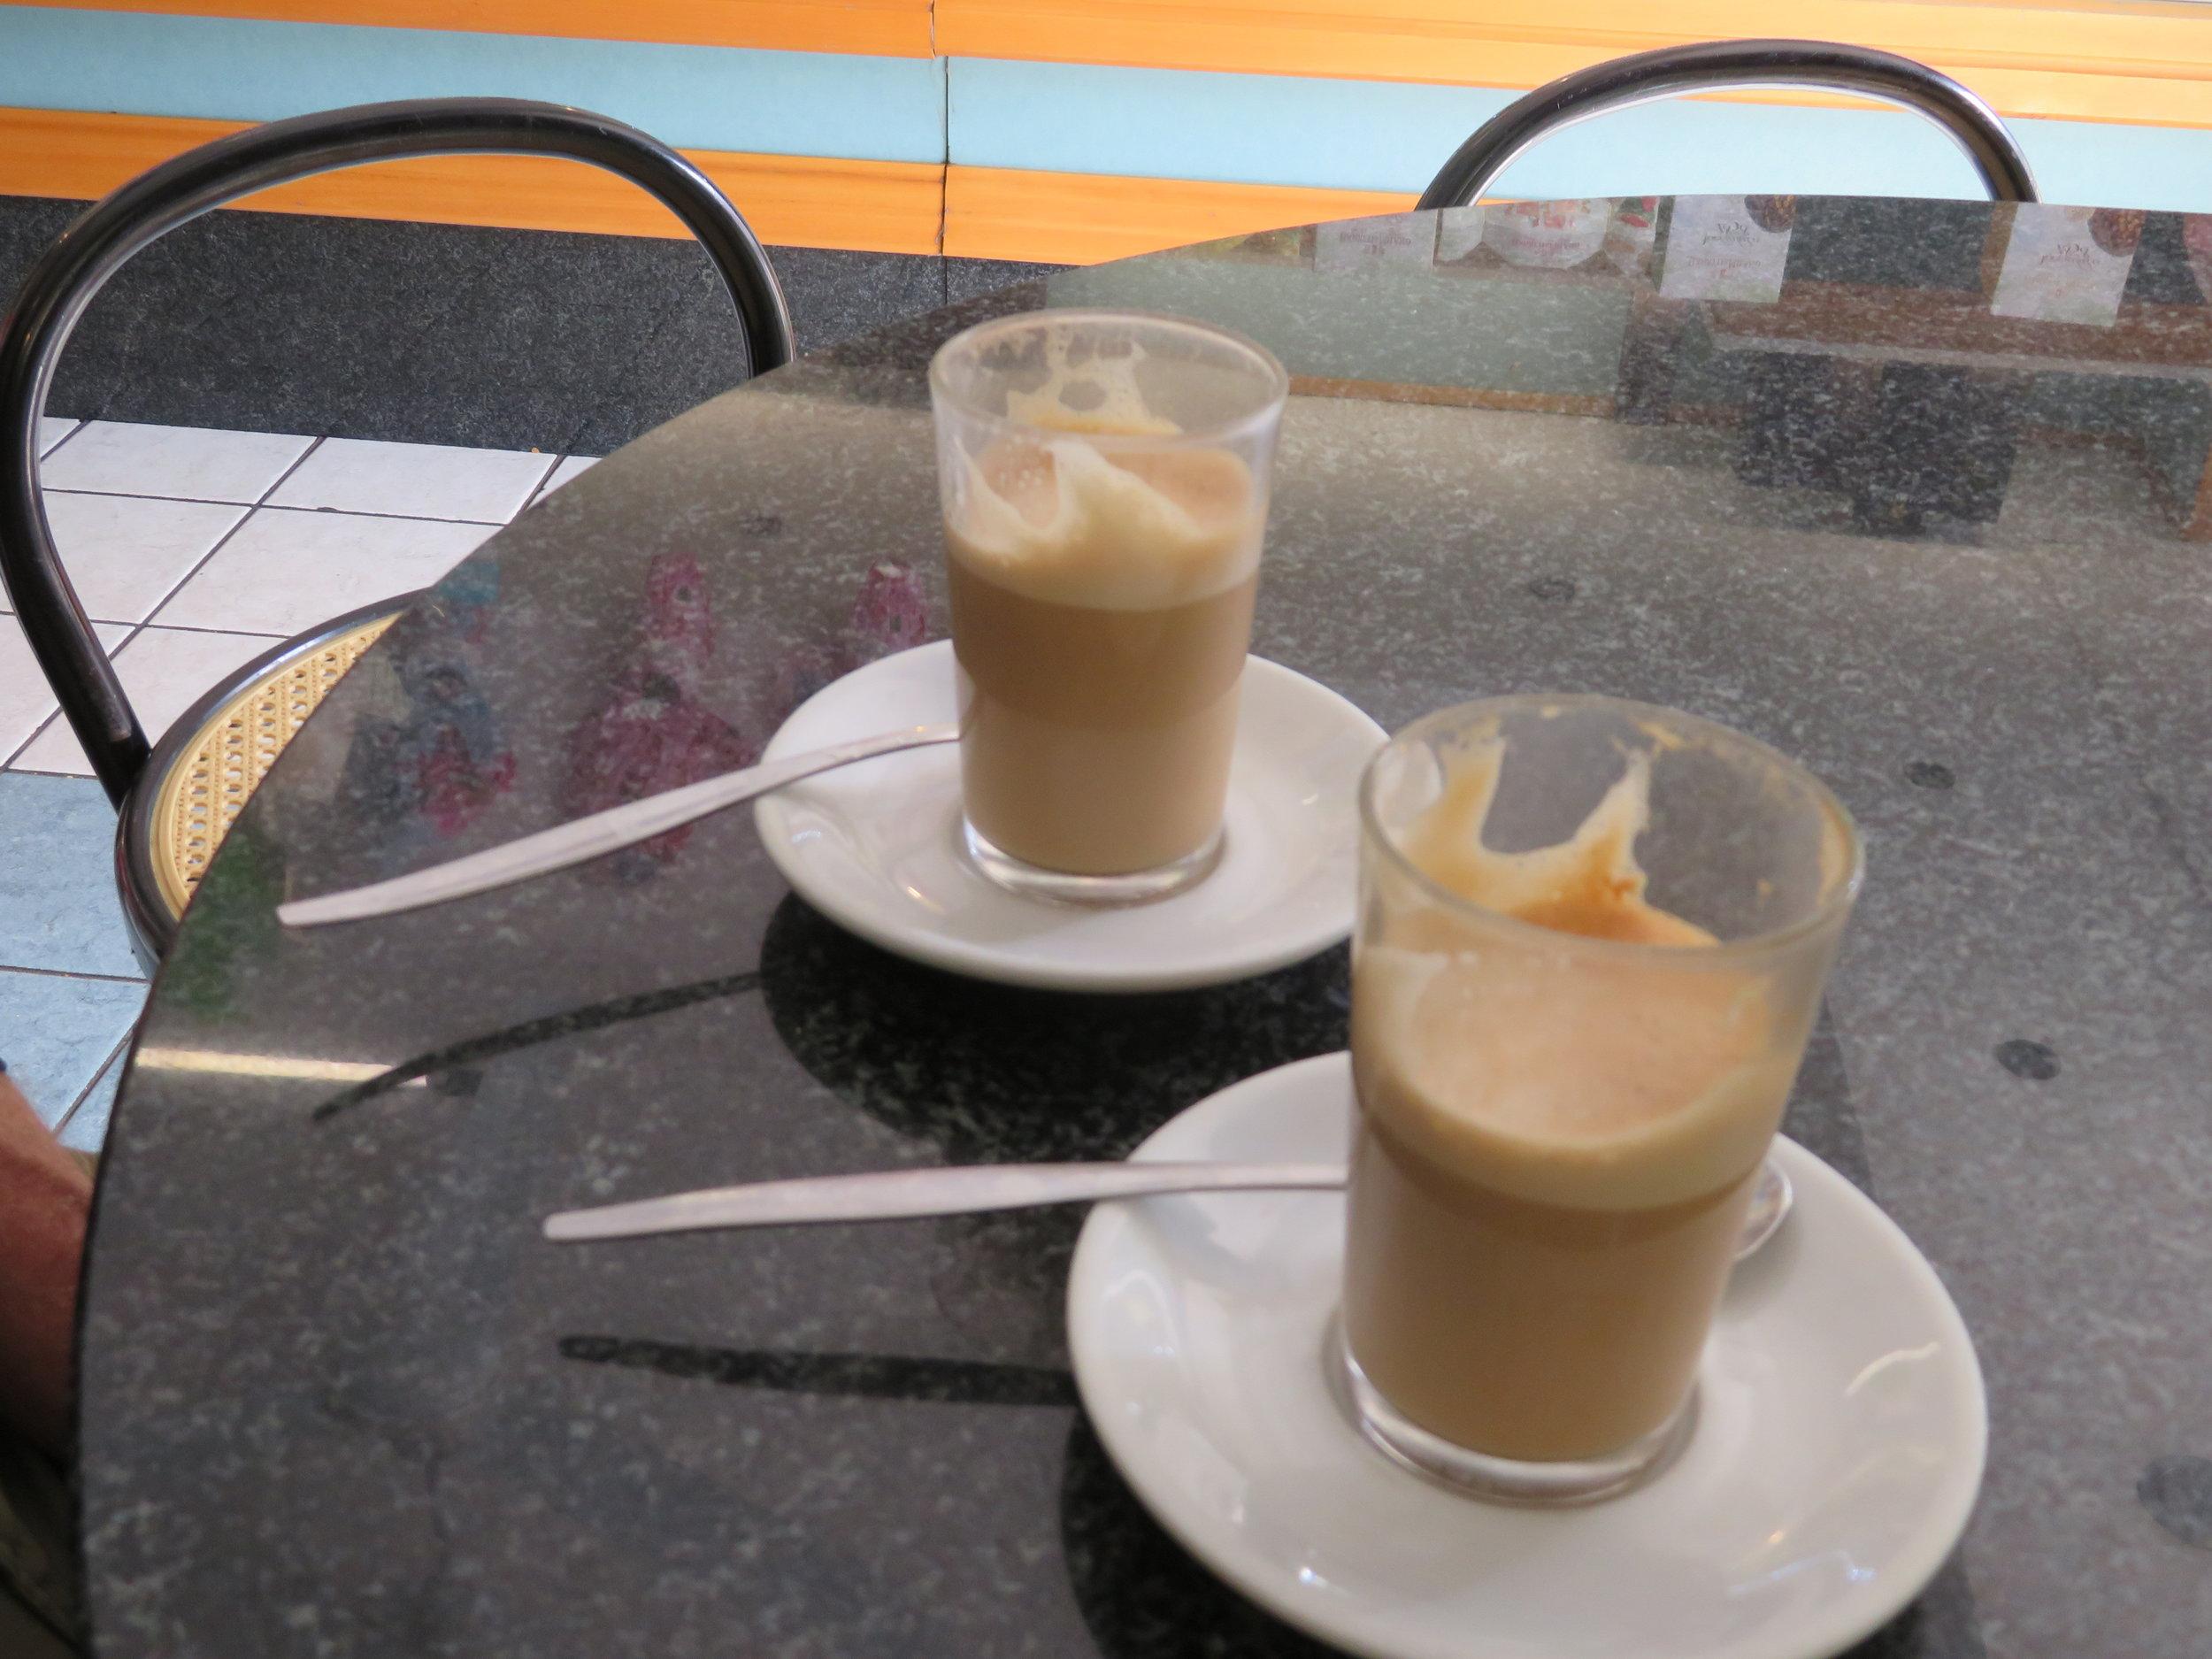 Caffe-latte, yum!